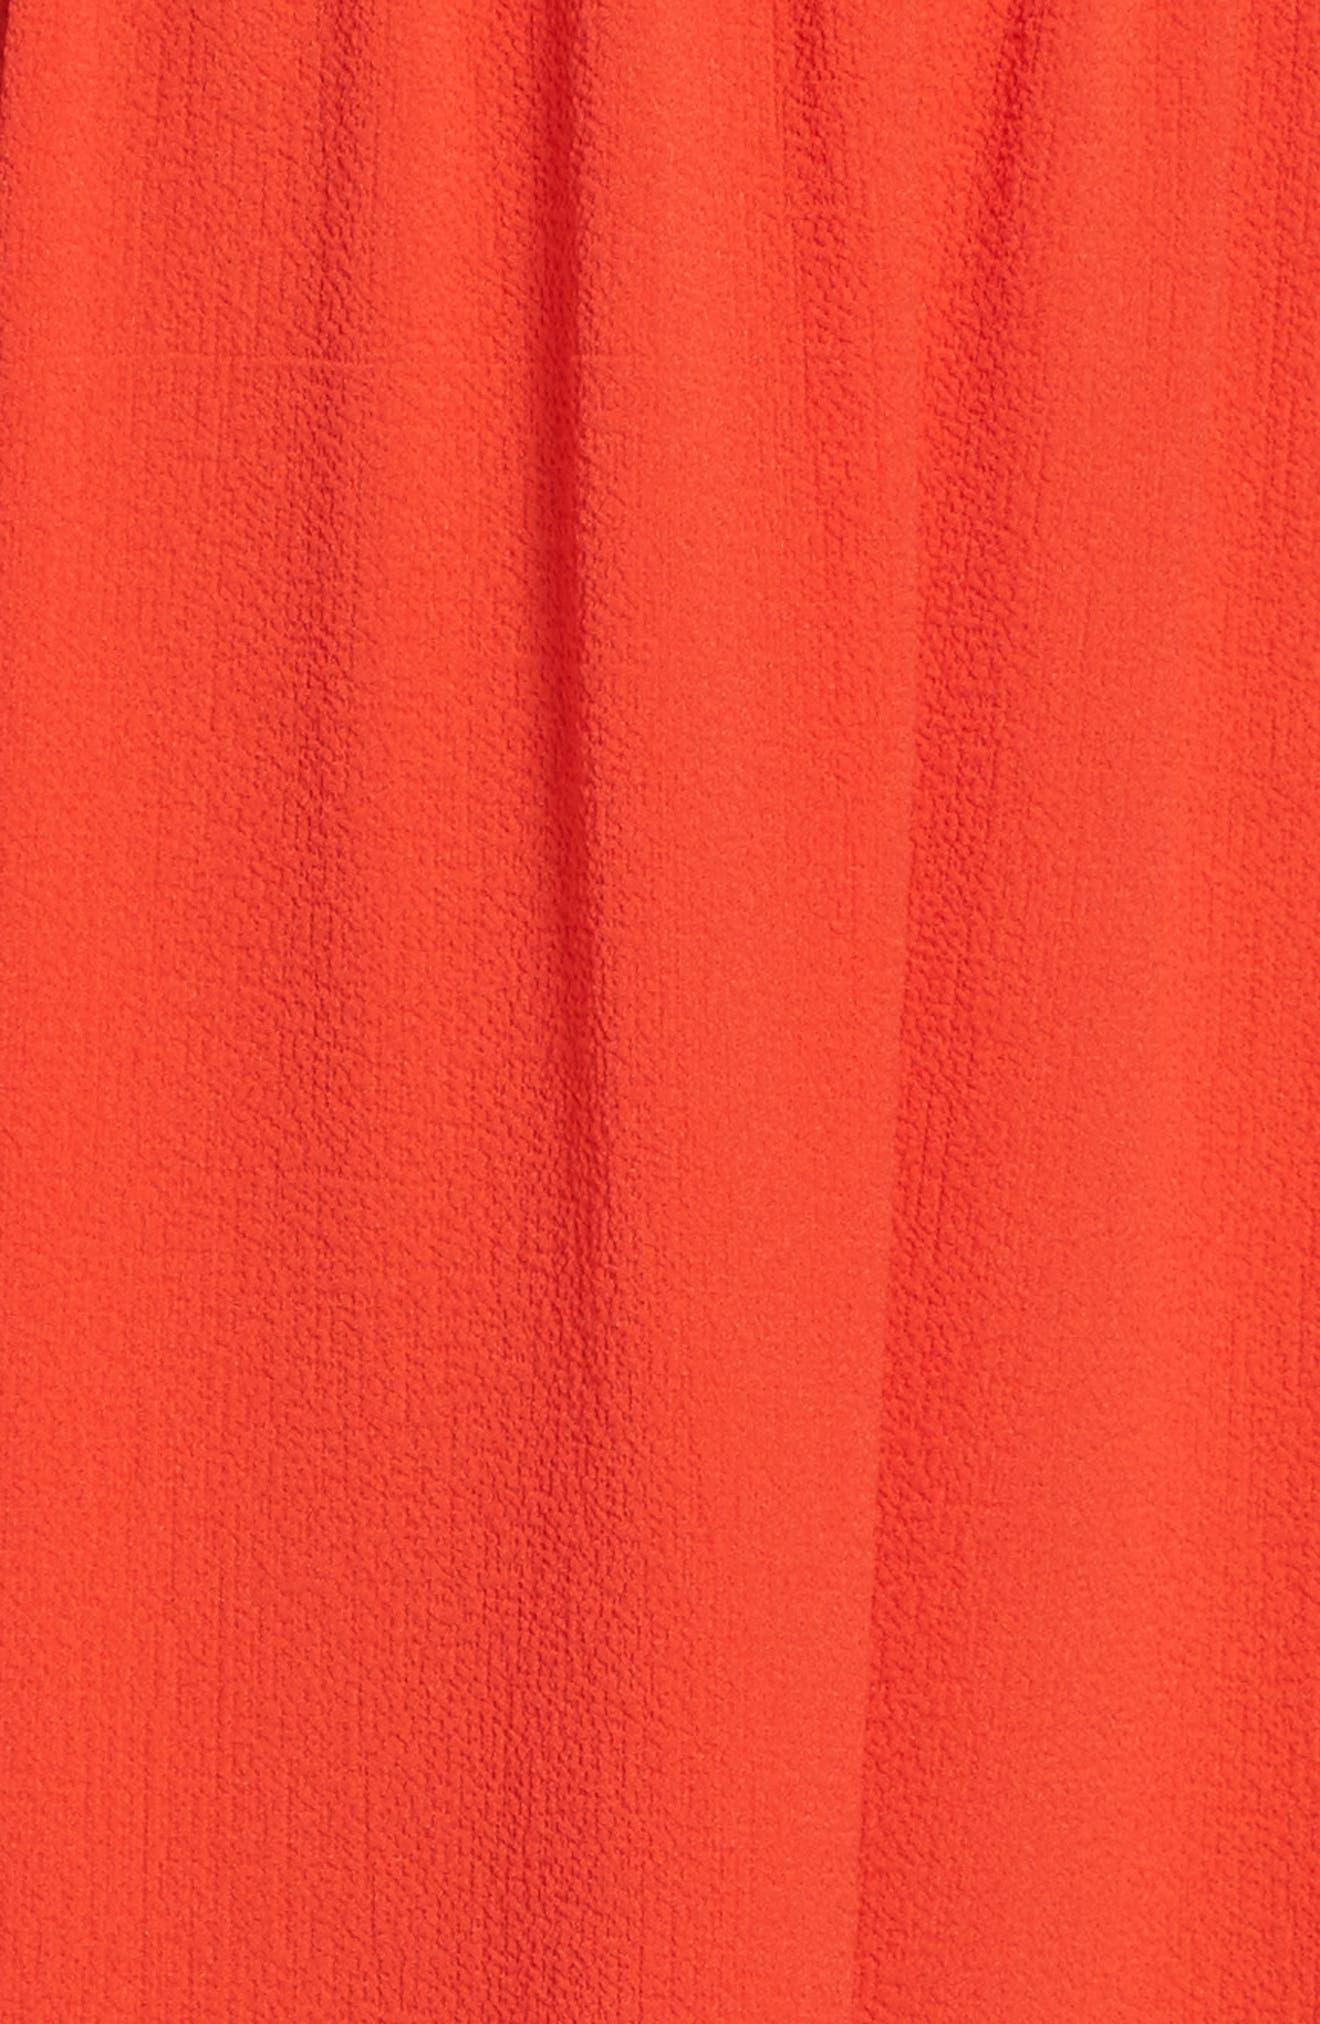 Off the Shoulder Crepe Dress,                             Alternate thumbnail 5, color,                             952